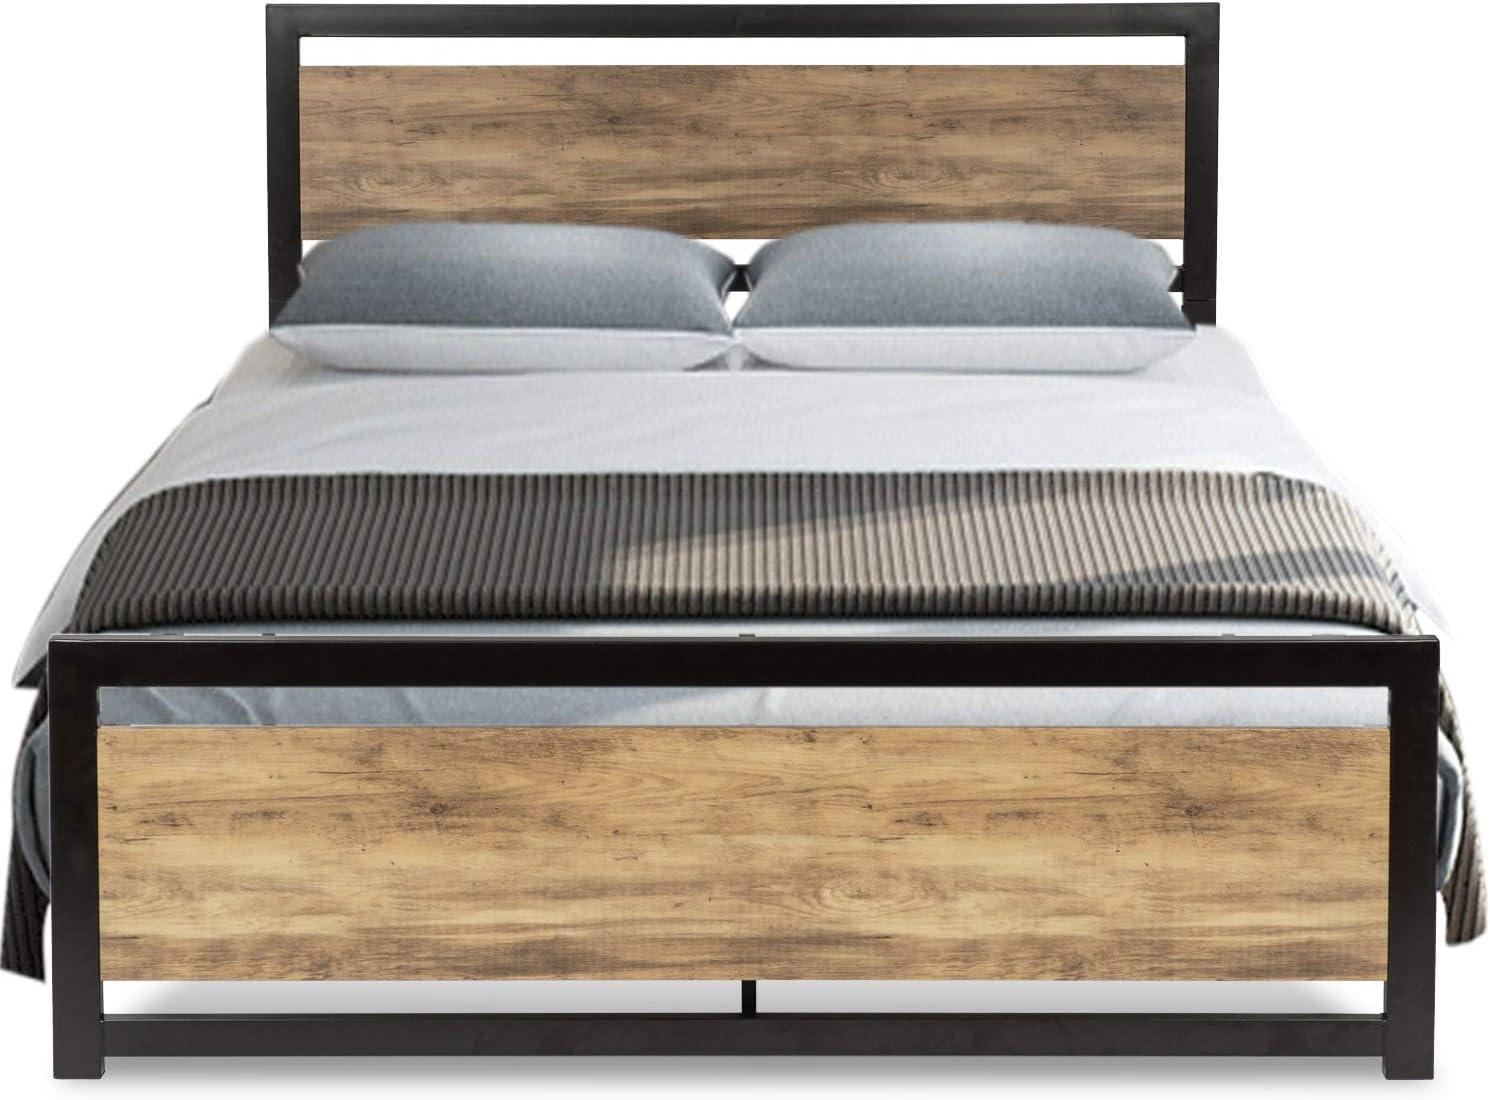 Amazon Com Urest Full Size Bed Frame With Headboard Platform